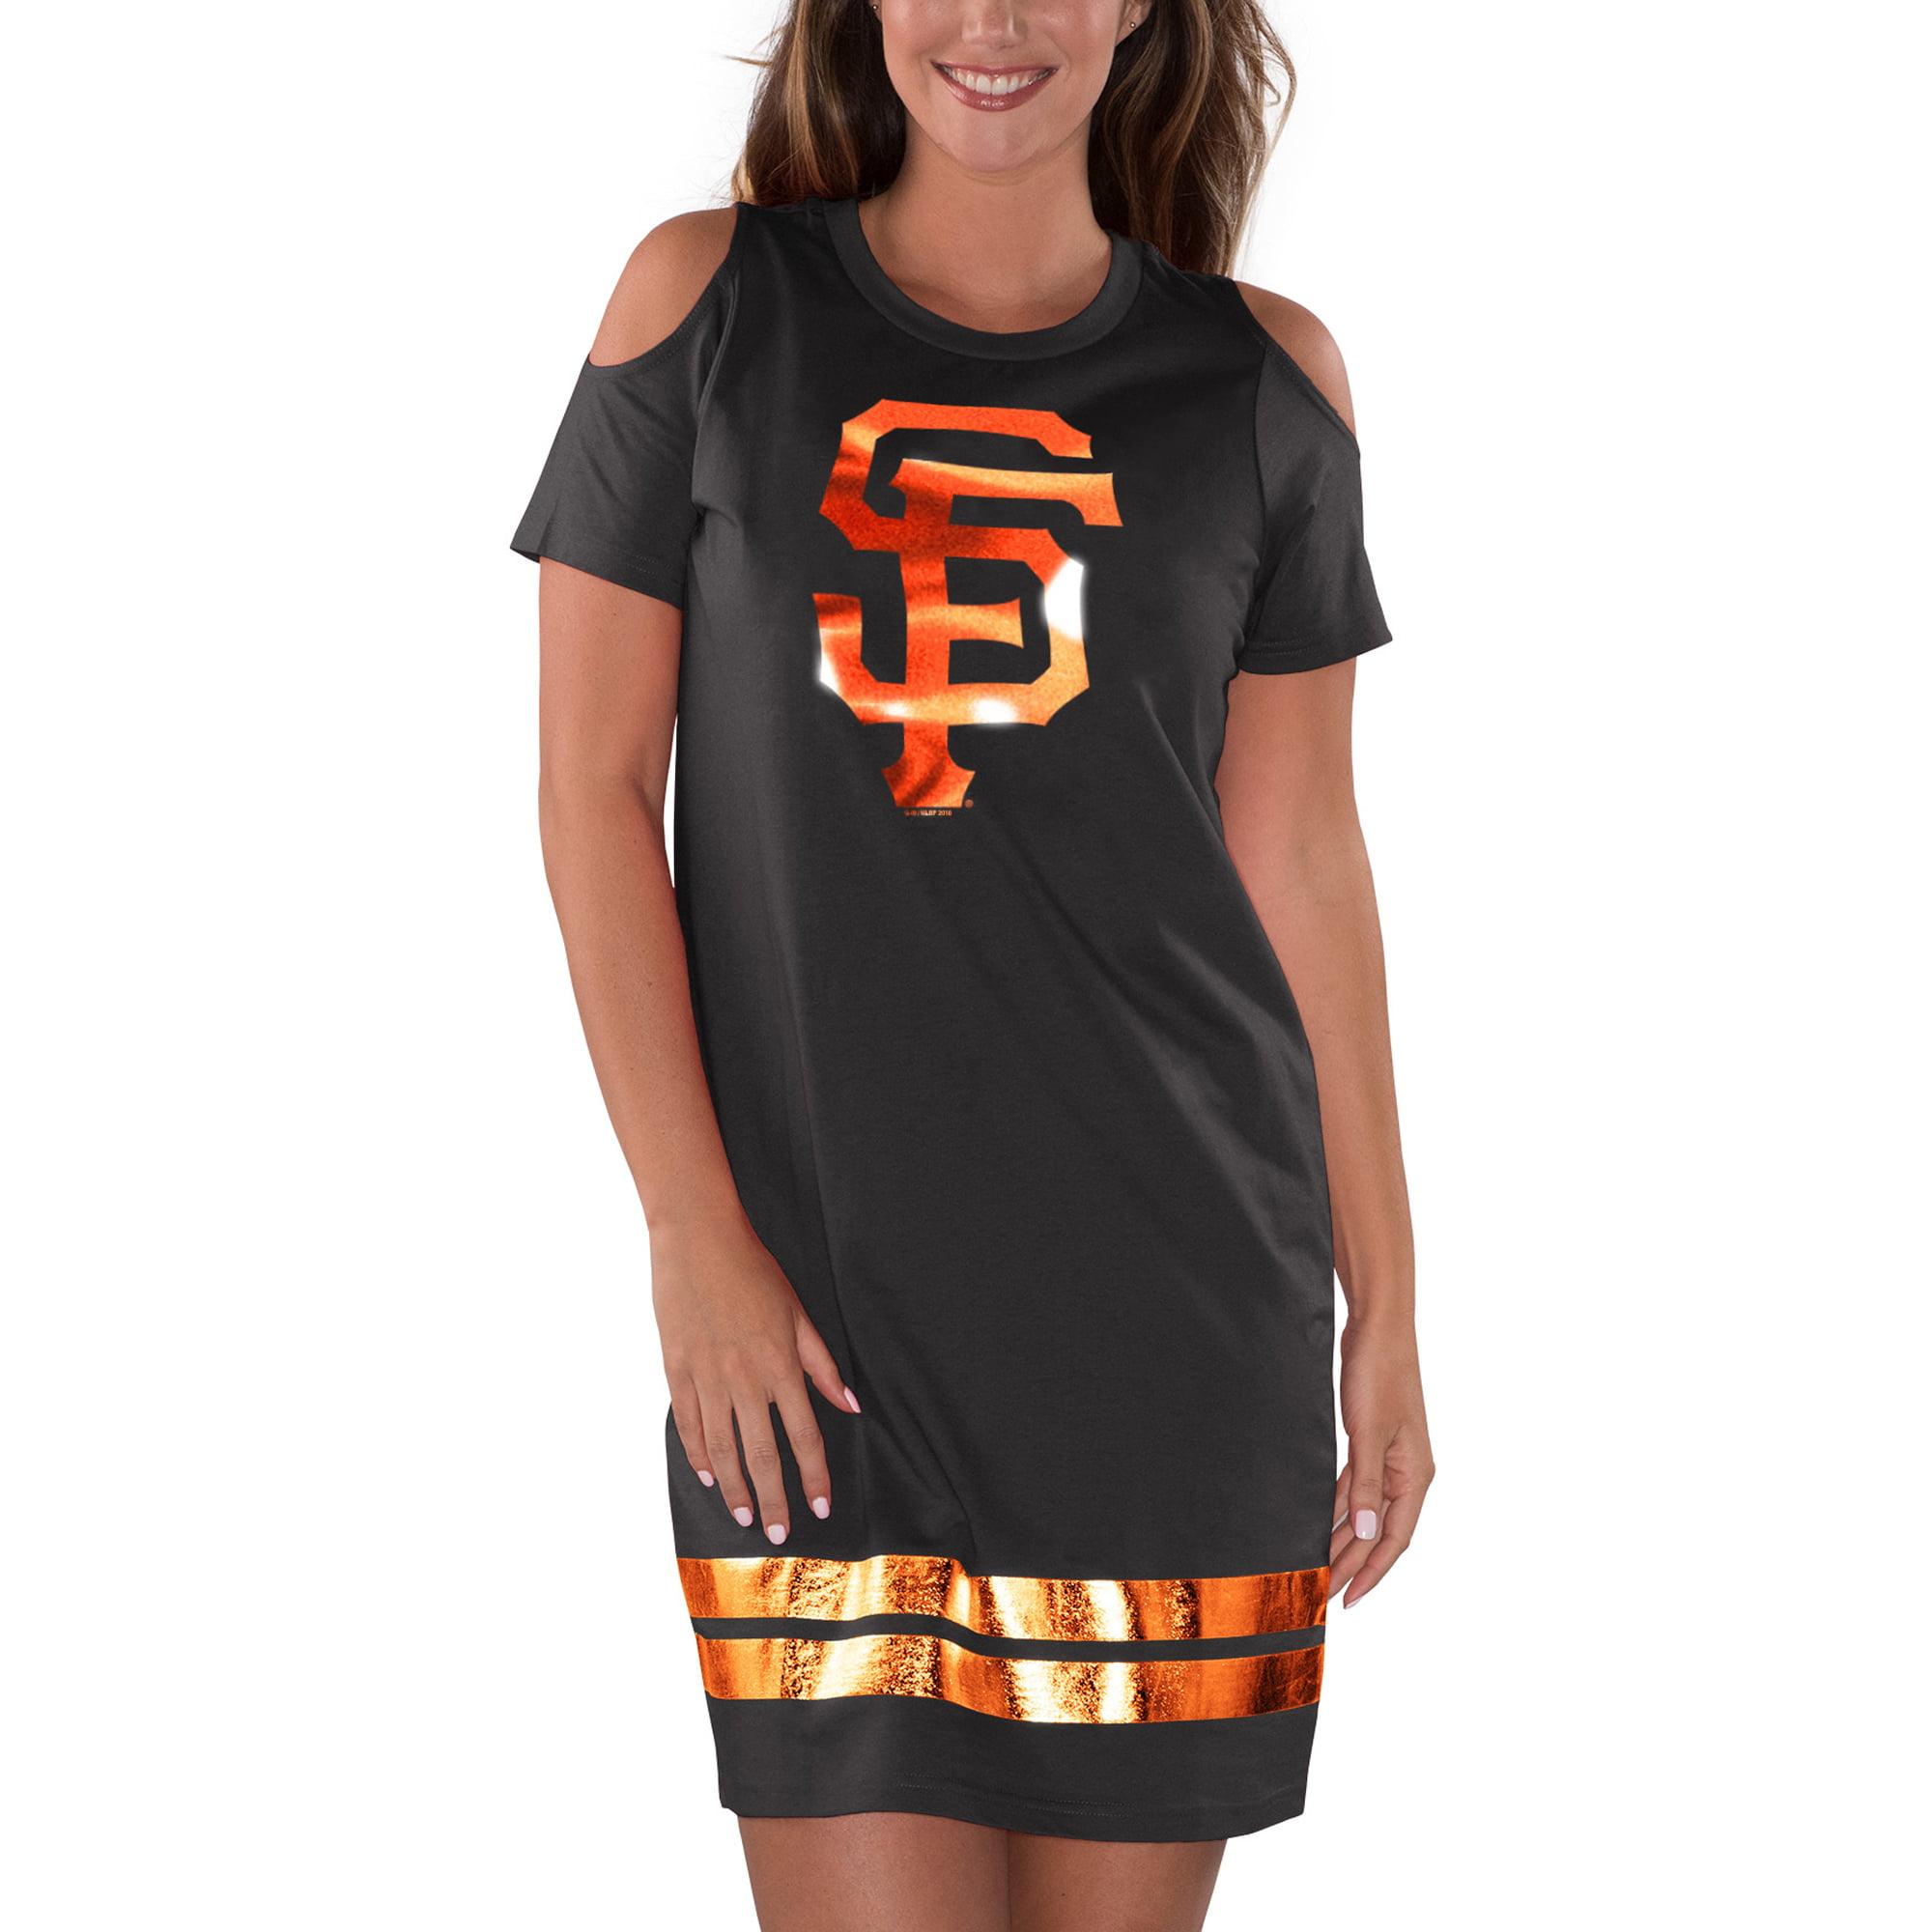 San Francisco Giants G-III 4Her by Carl Banks Women's Final's Tri-Blend Dress - Black